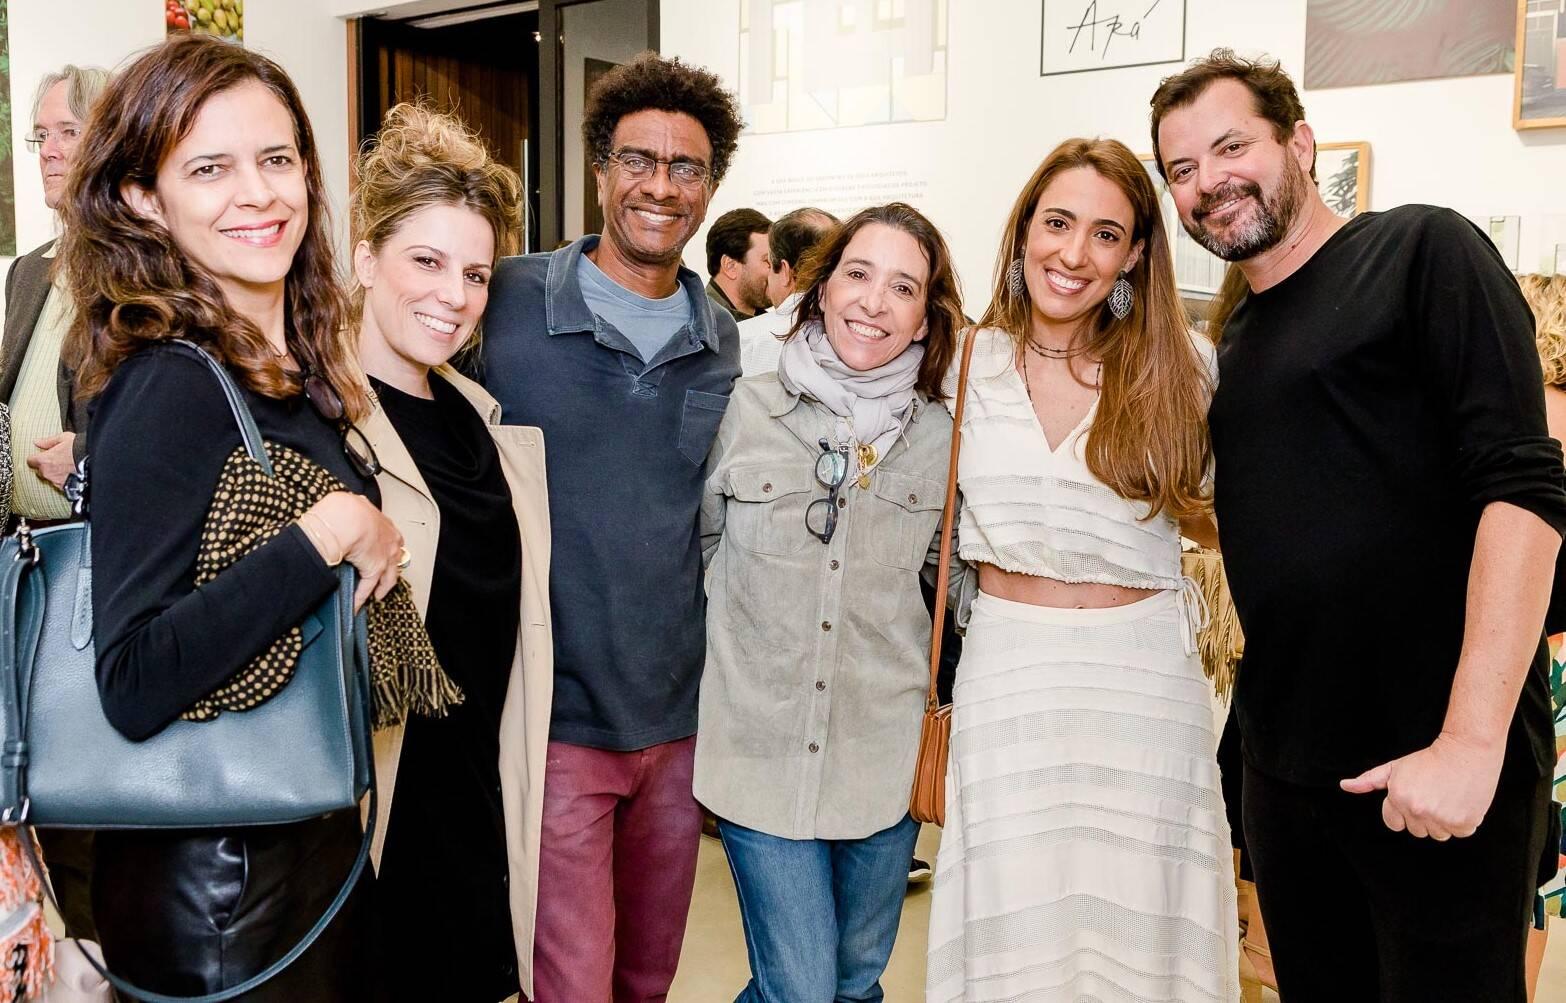 Isabela Abdala, Daniela Pinheiro,  Hélio de La Peña, Ana Quintella, Paula Marinho e Miguel Pinto Guimarães  /Foto: Bruno Ryfer